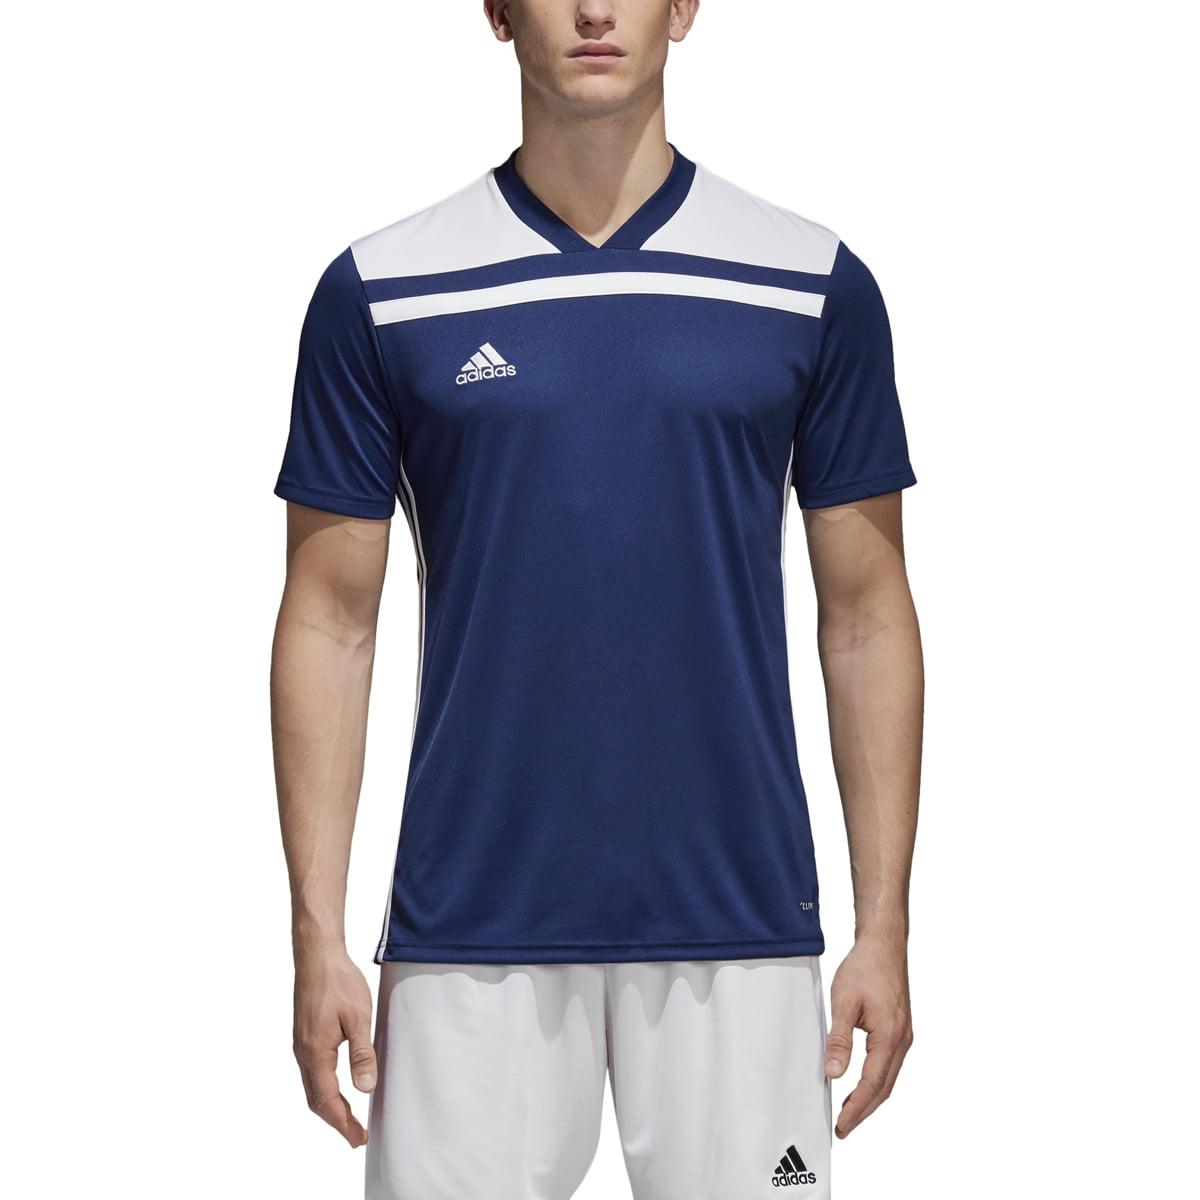 Adidas Mens Soccer Regista 18 Jersey Adidas - Ships Directly From Adidas